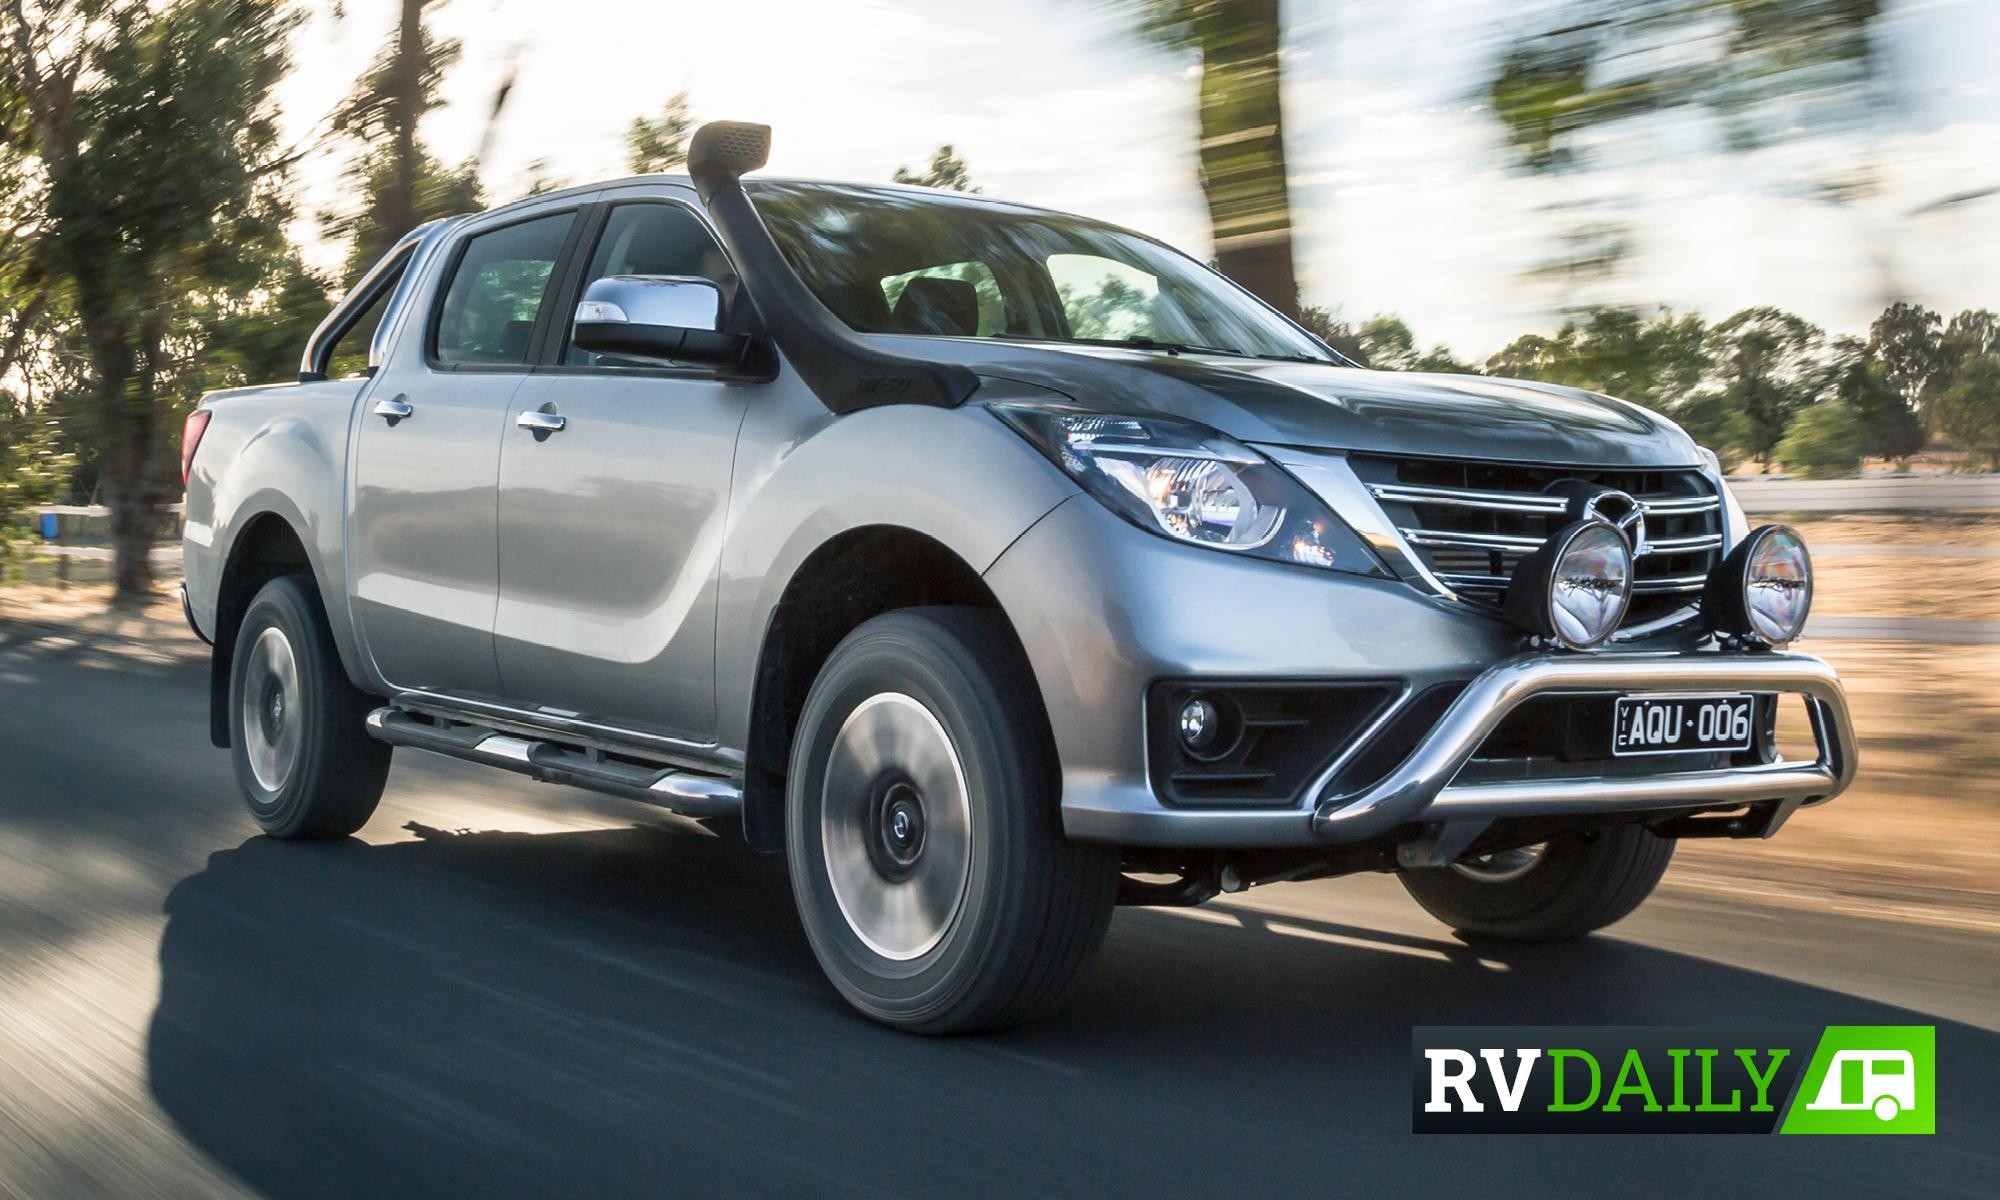 Driven: 2019 Mazda BT-50 gets updated